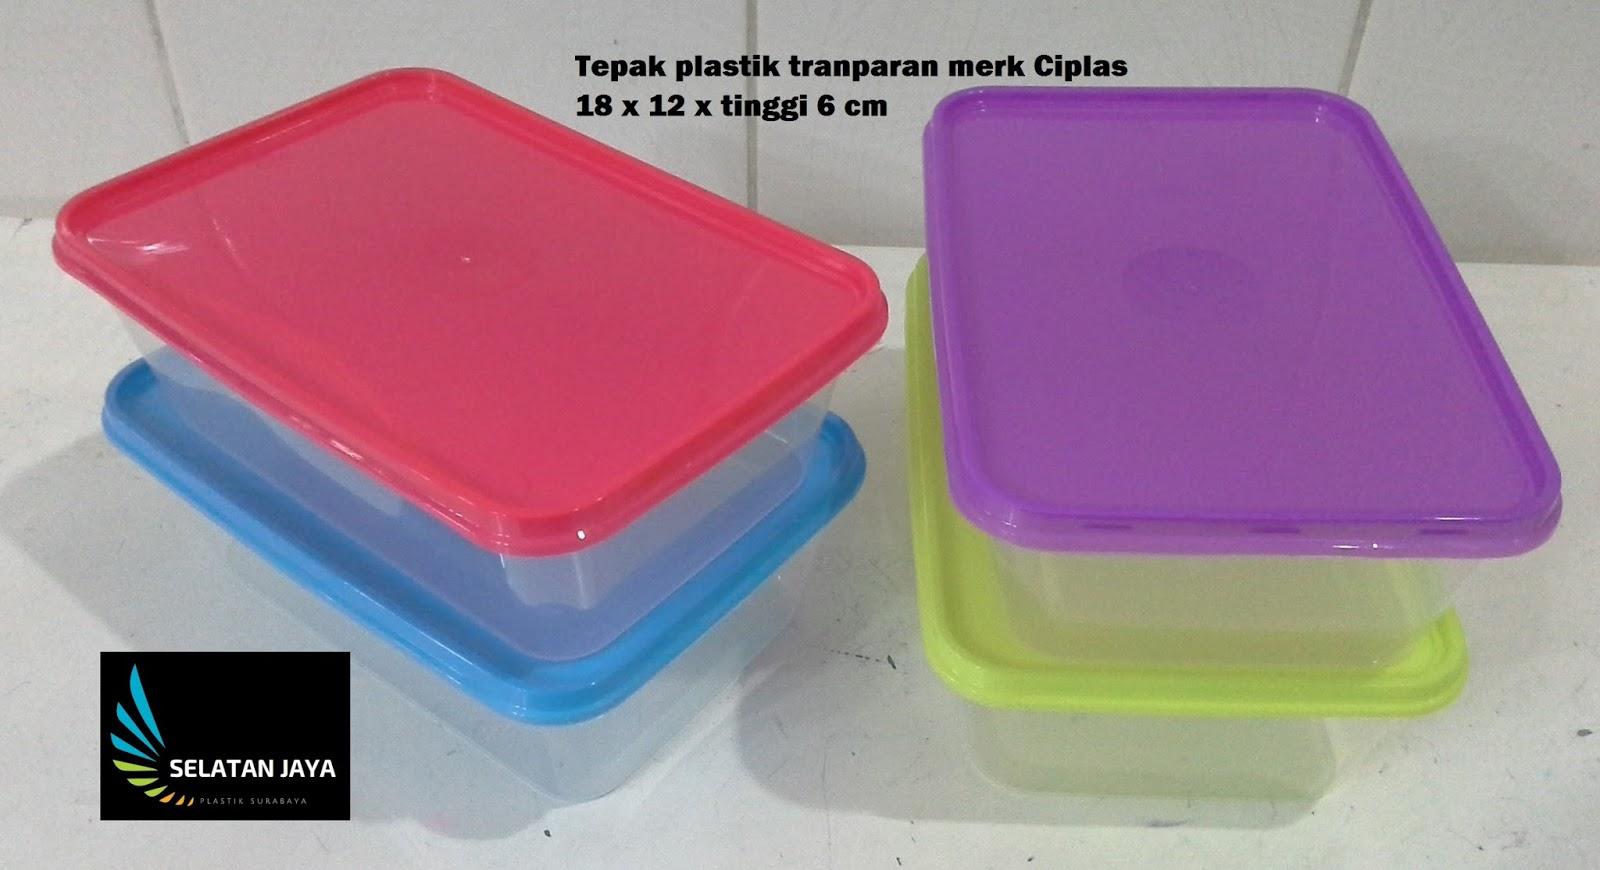 Tepak plastik murah transparan merk ciplas tutup merah biru kuning ungu 81e39437d1